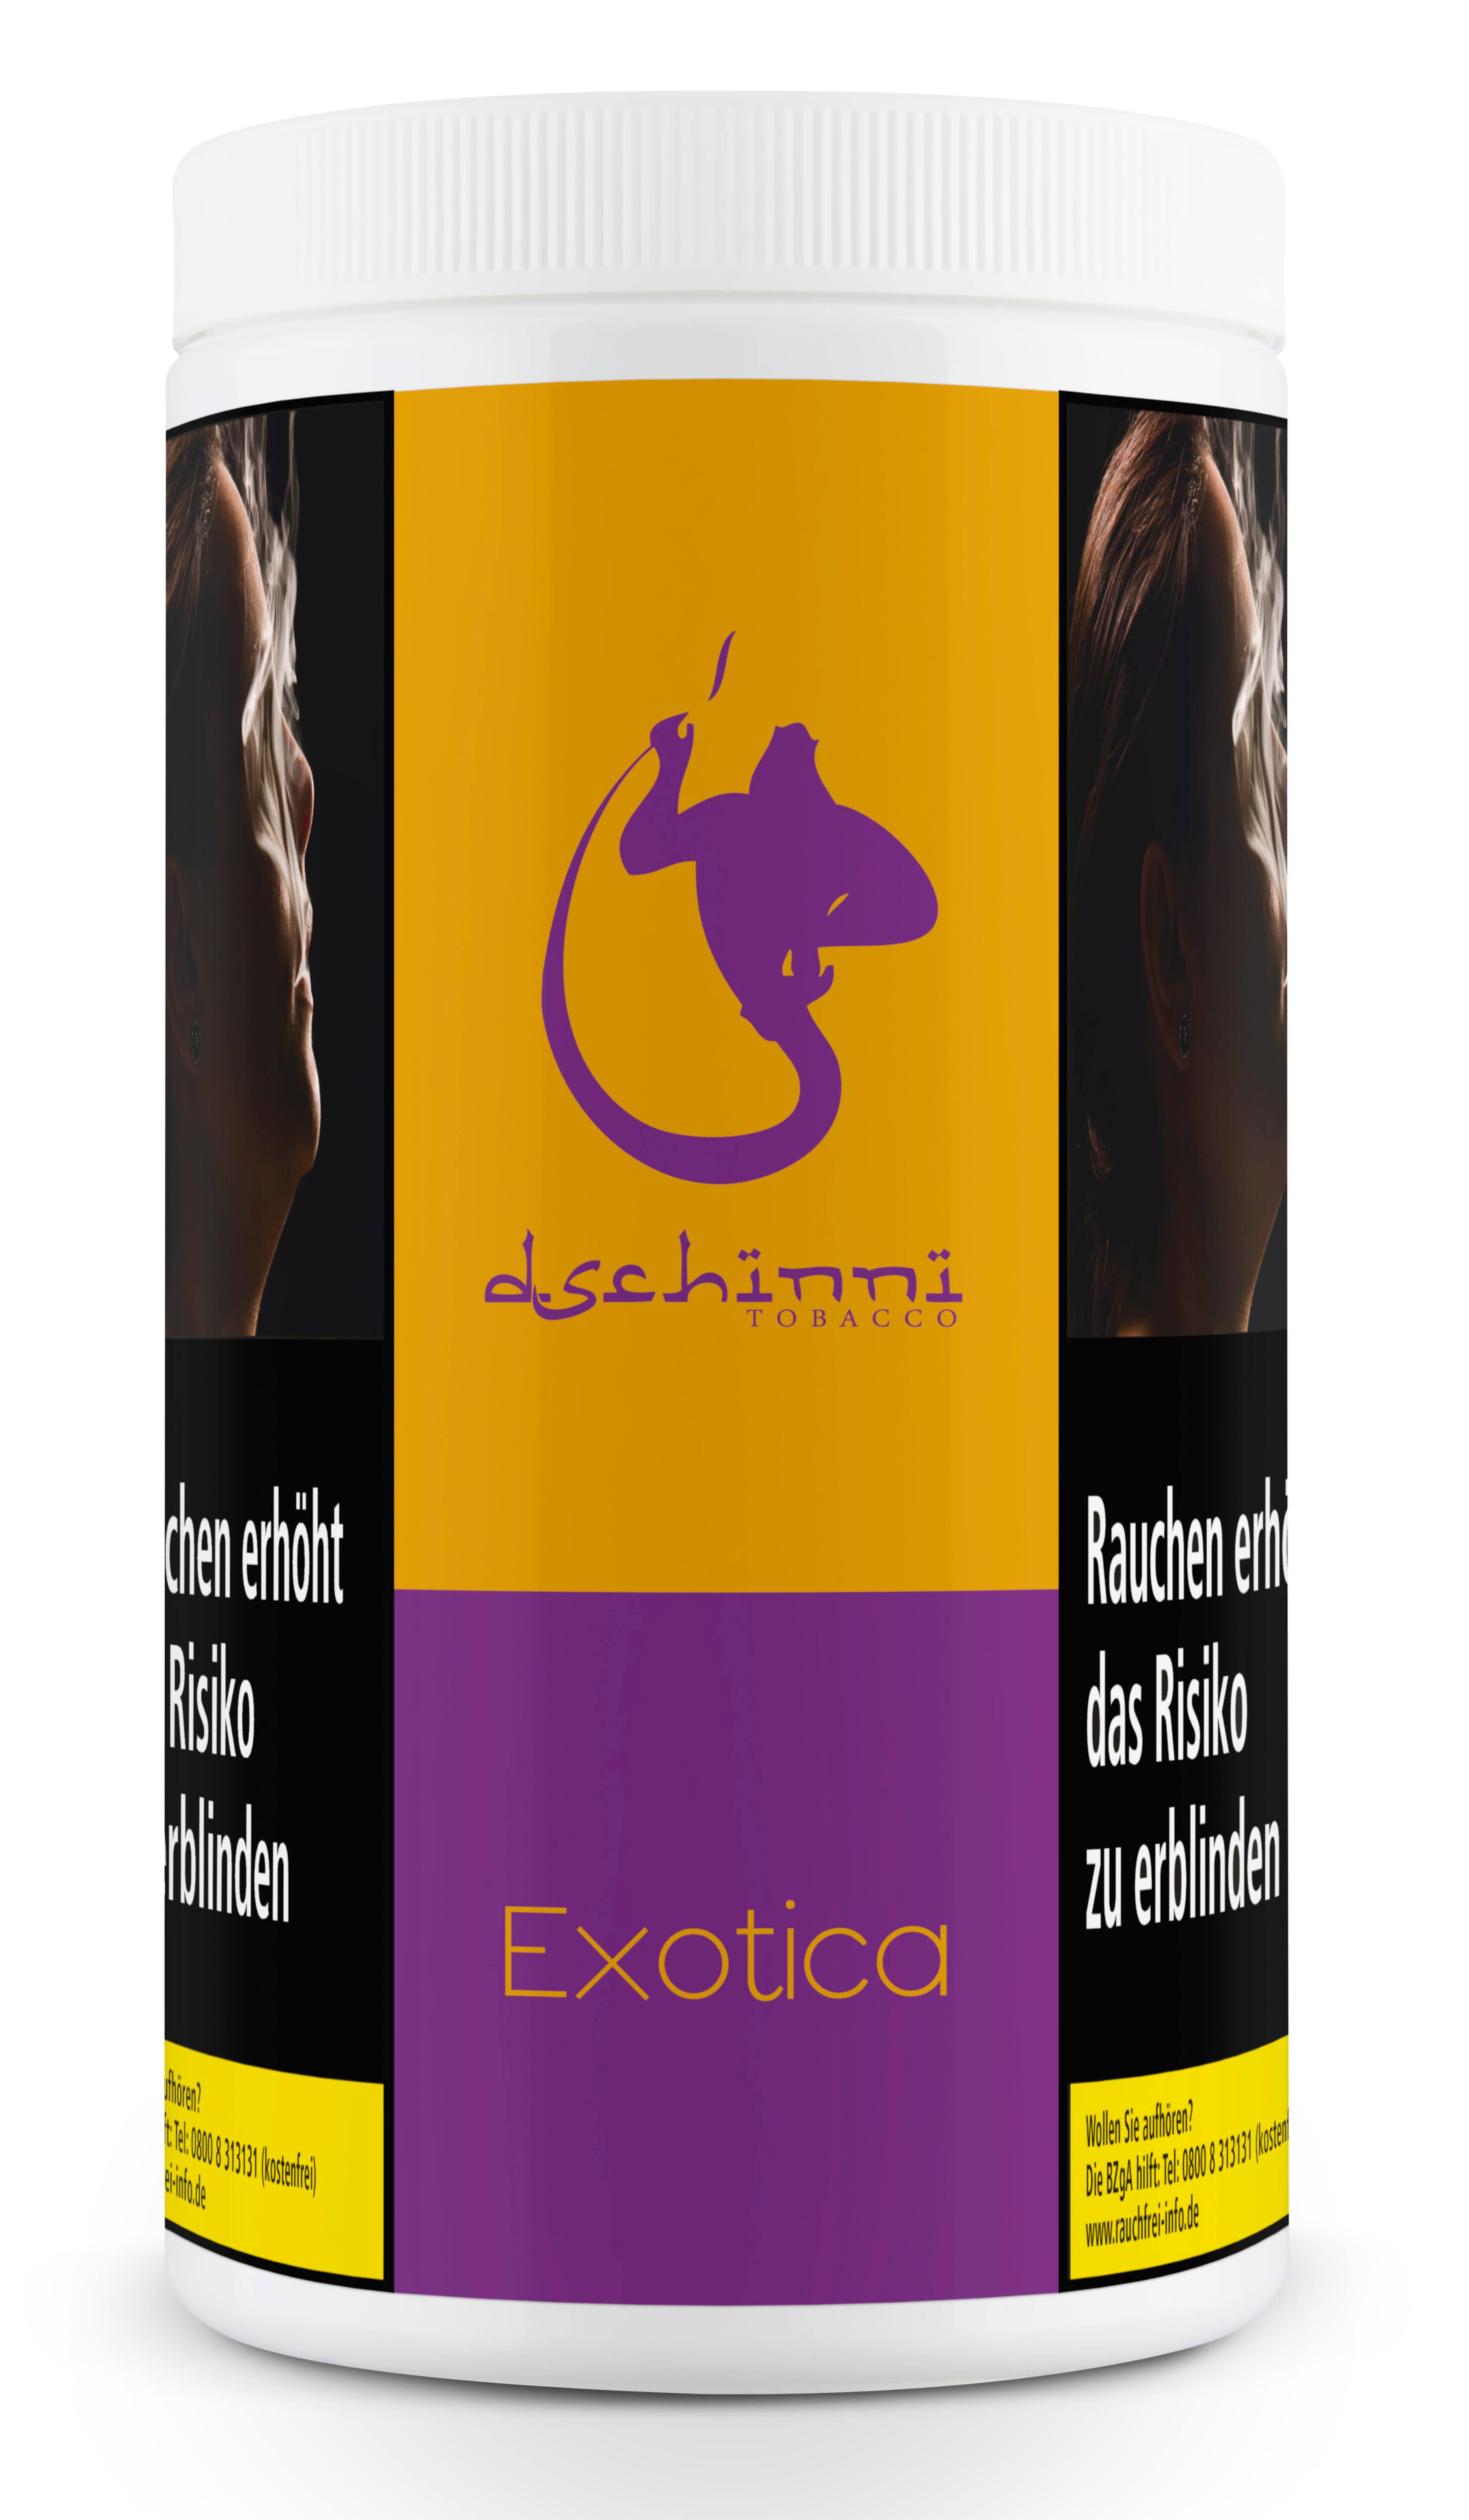 Dschinni Tobacco - Exotica 1kg